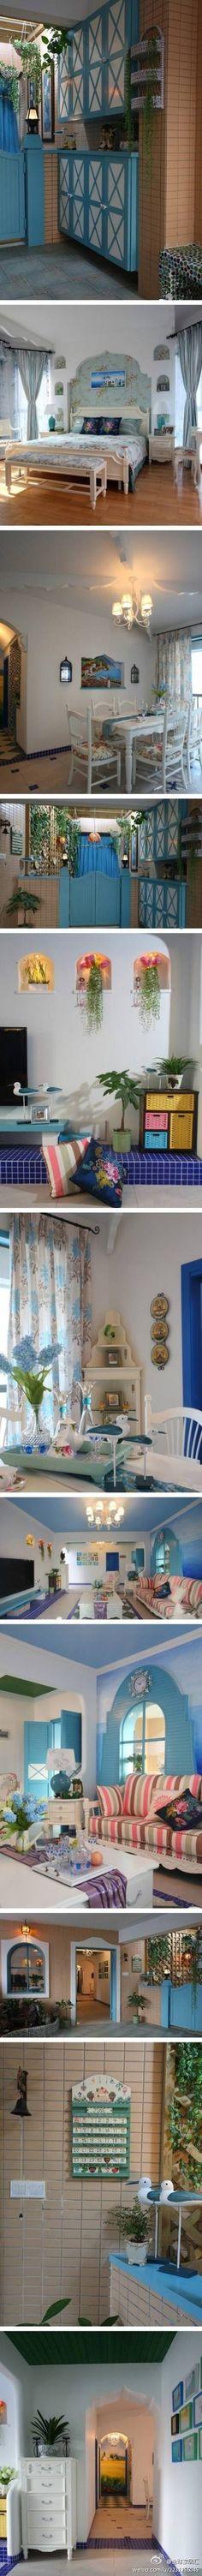 Dream blue house